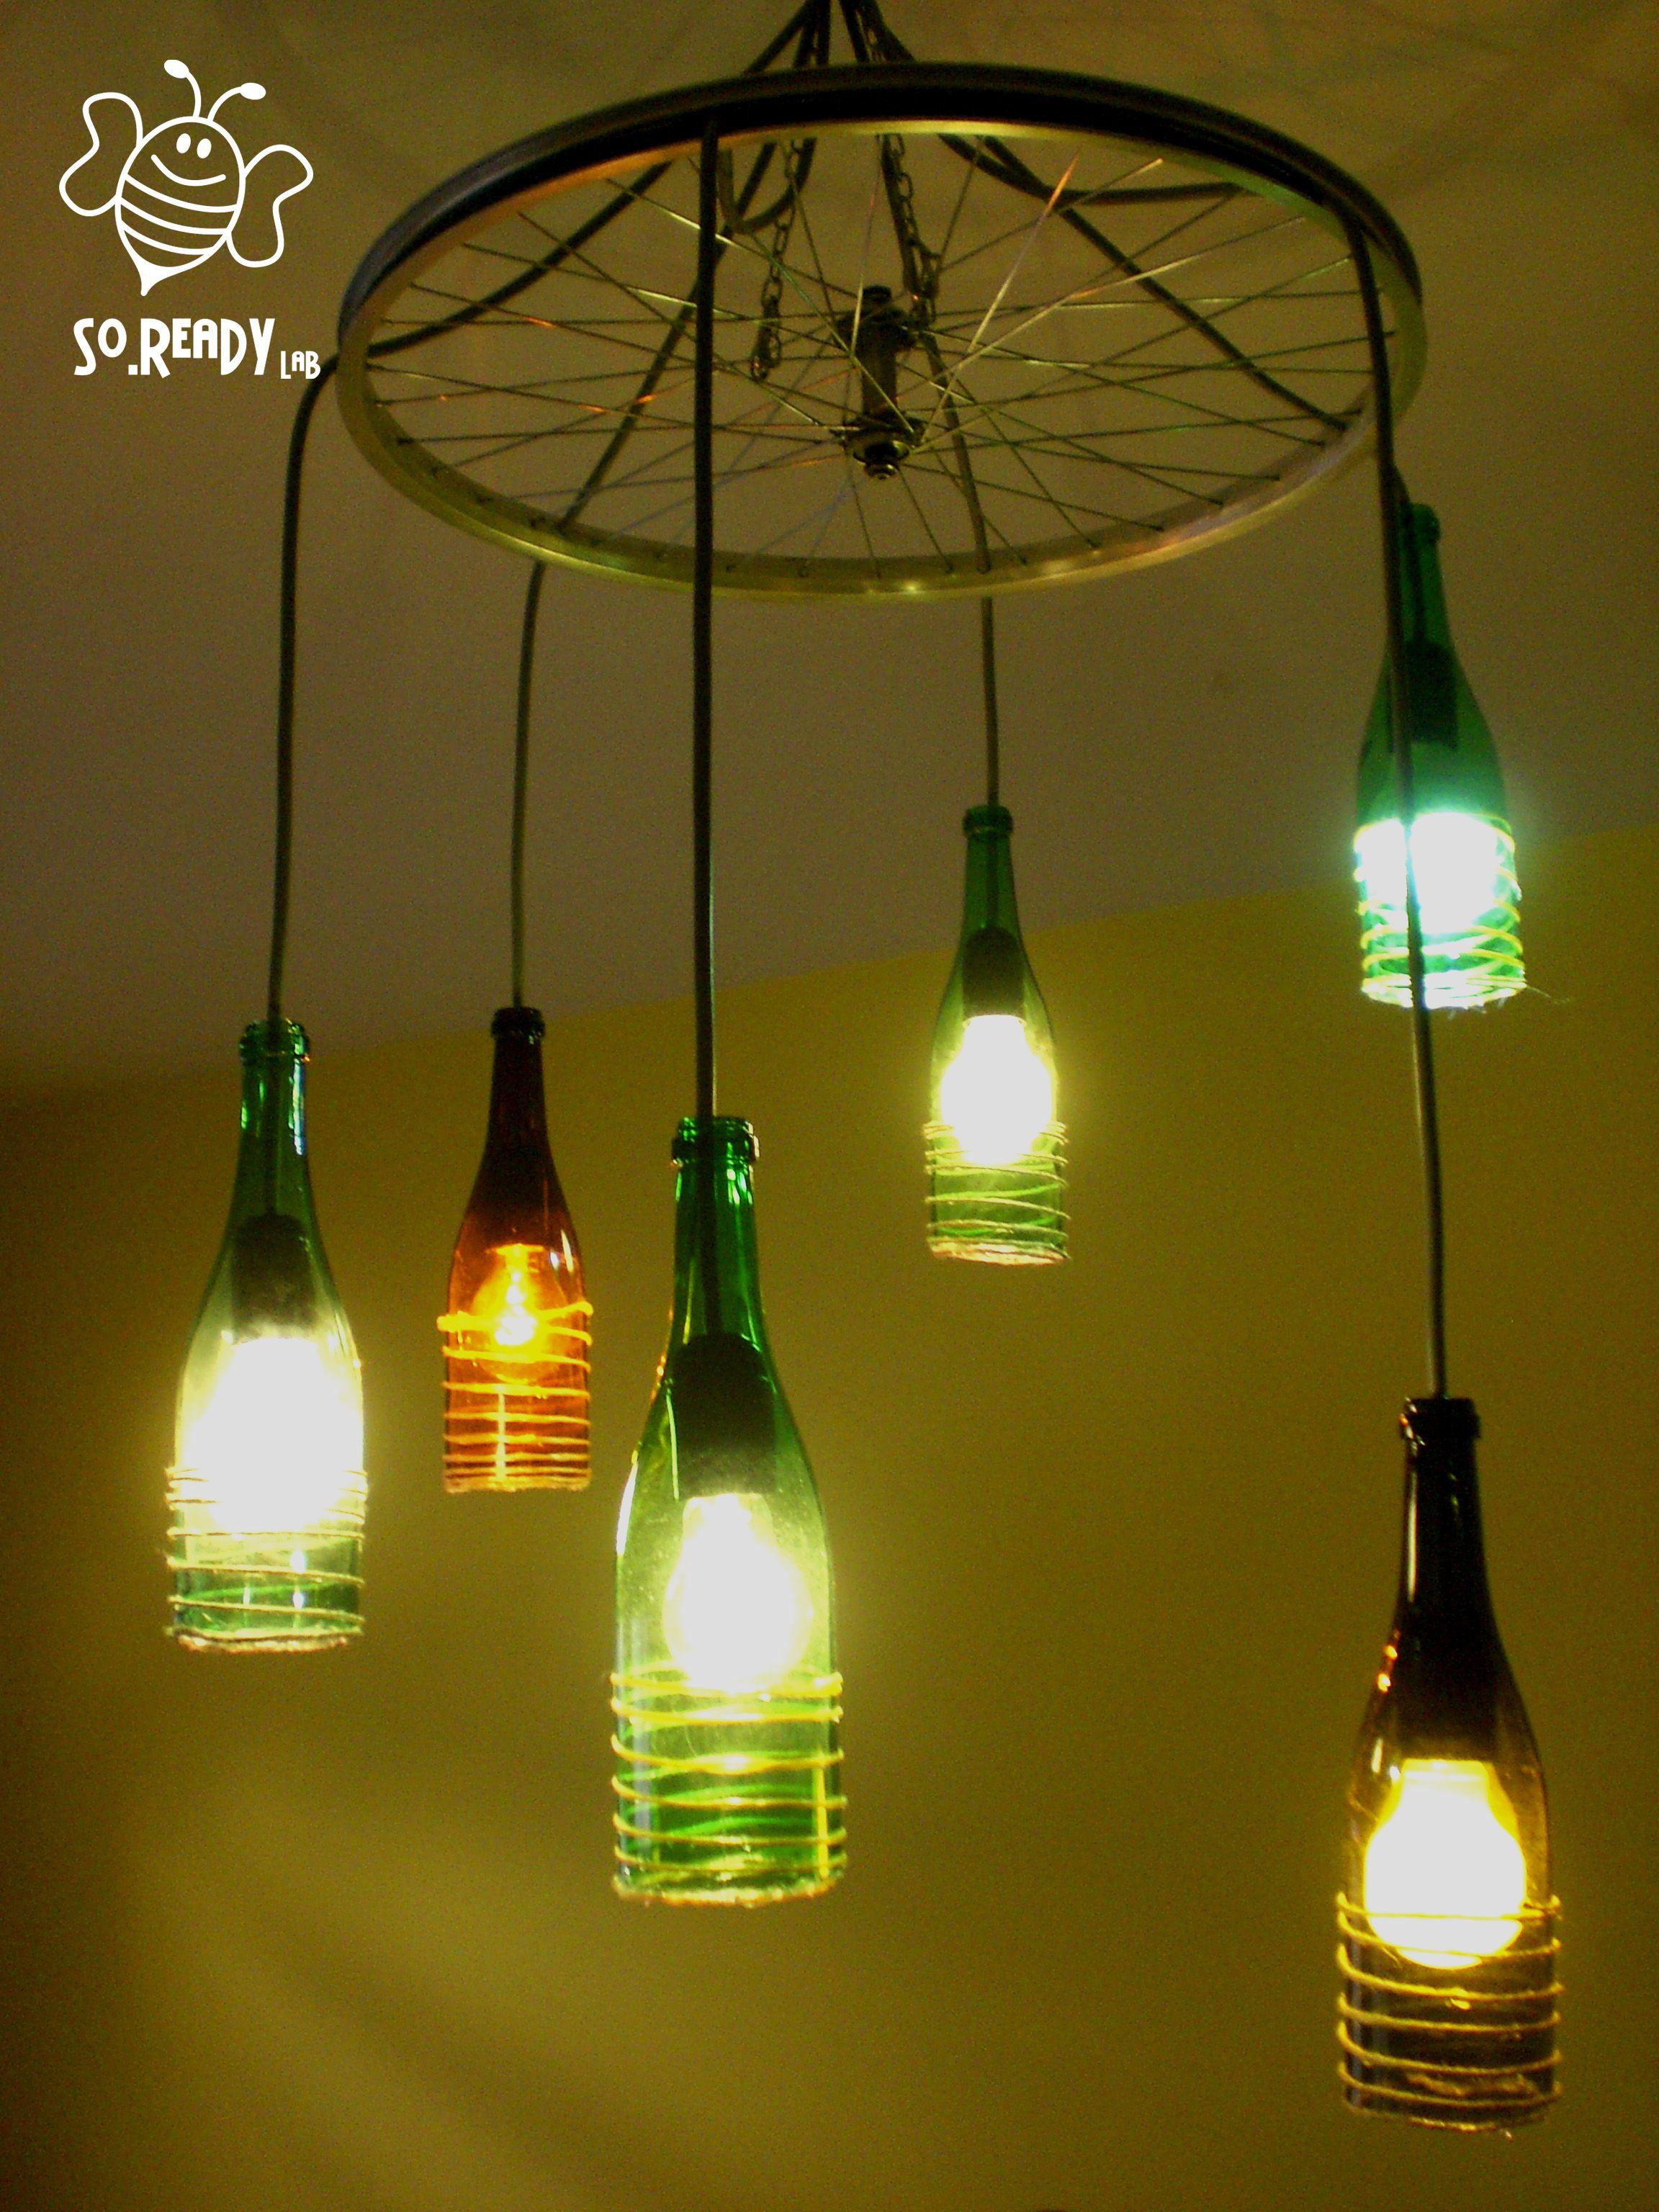 Lampadario con bottiglie riciclate. lampadario recycle